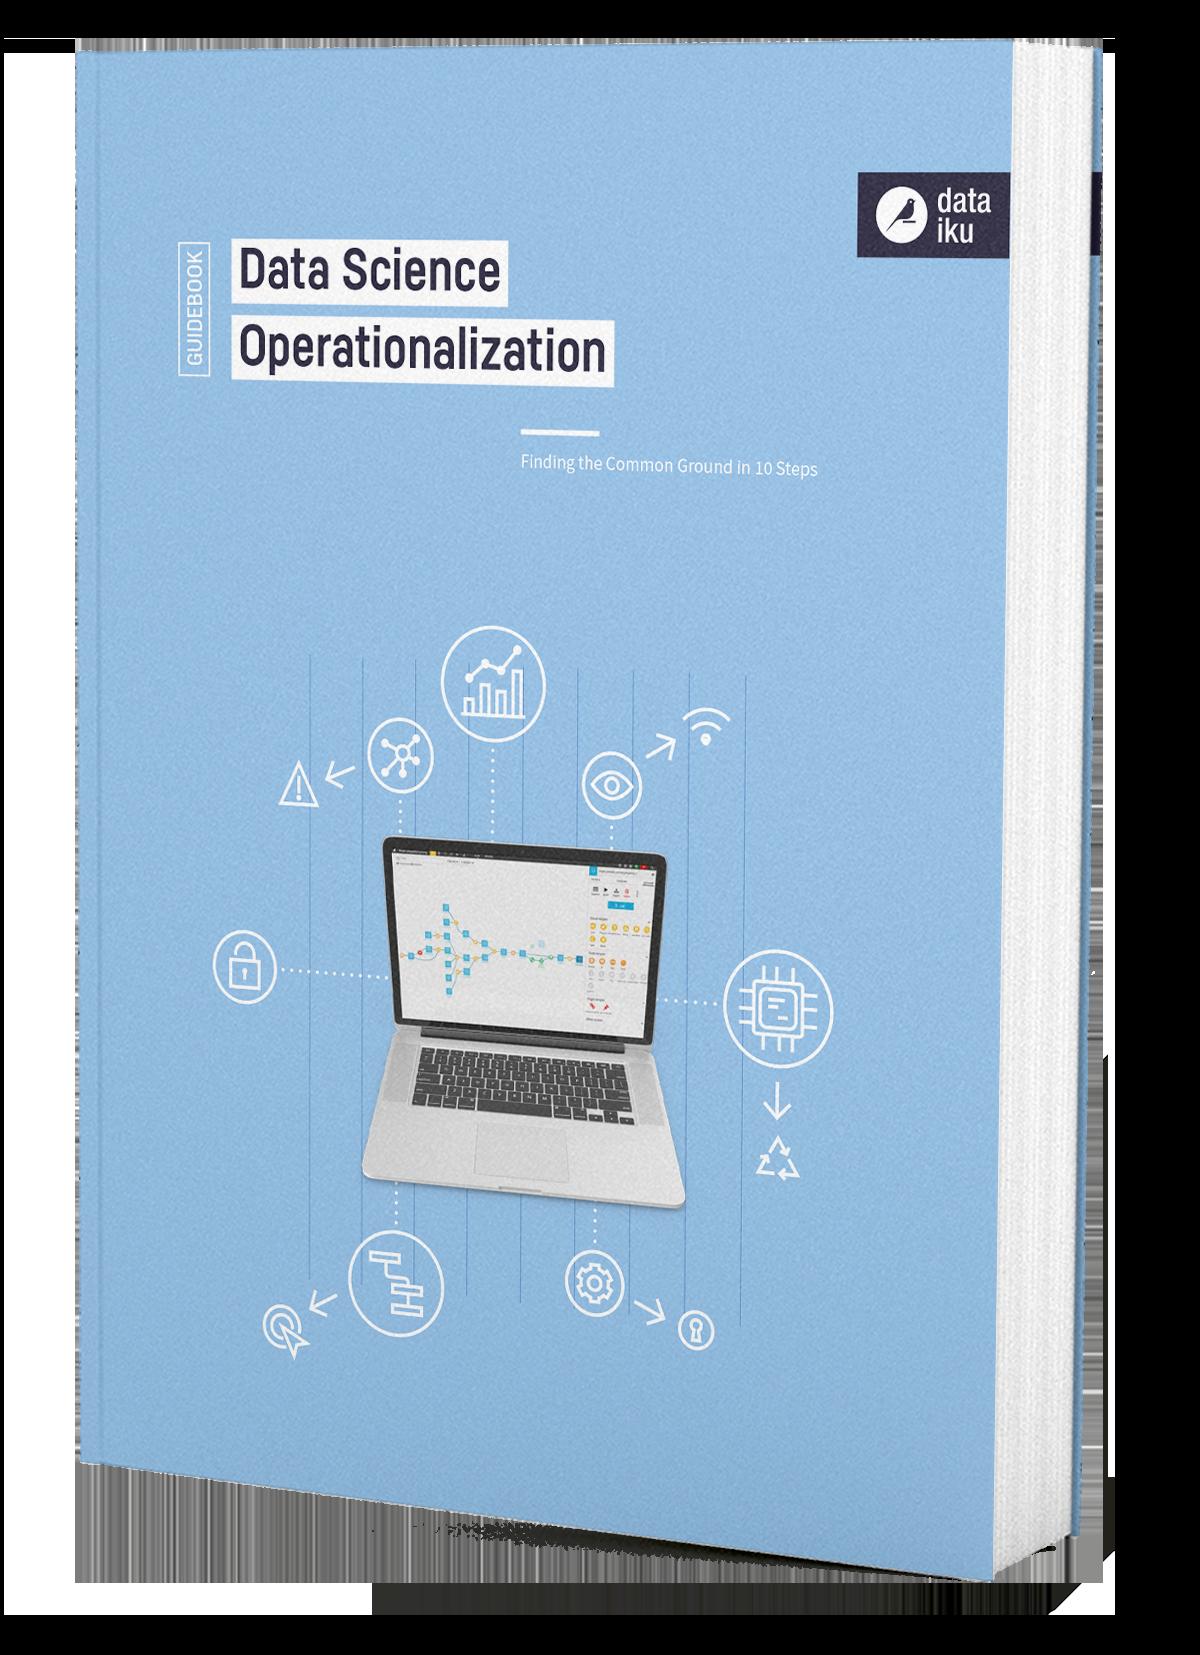 DKU-DATAIKU-EBOOK_COVER-WEB-DATA_SCIENCE_OPERATIONALIZATION_GUIDEBOOK-BAT_210518